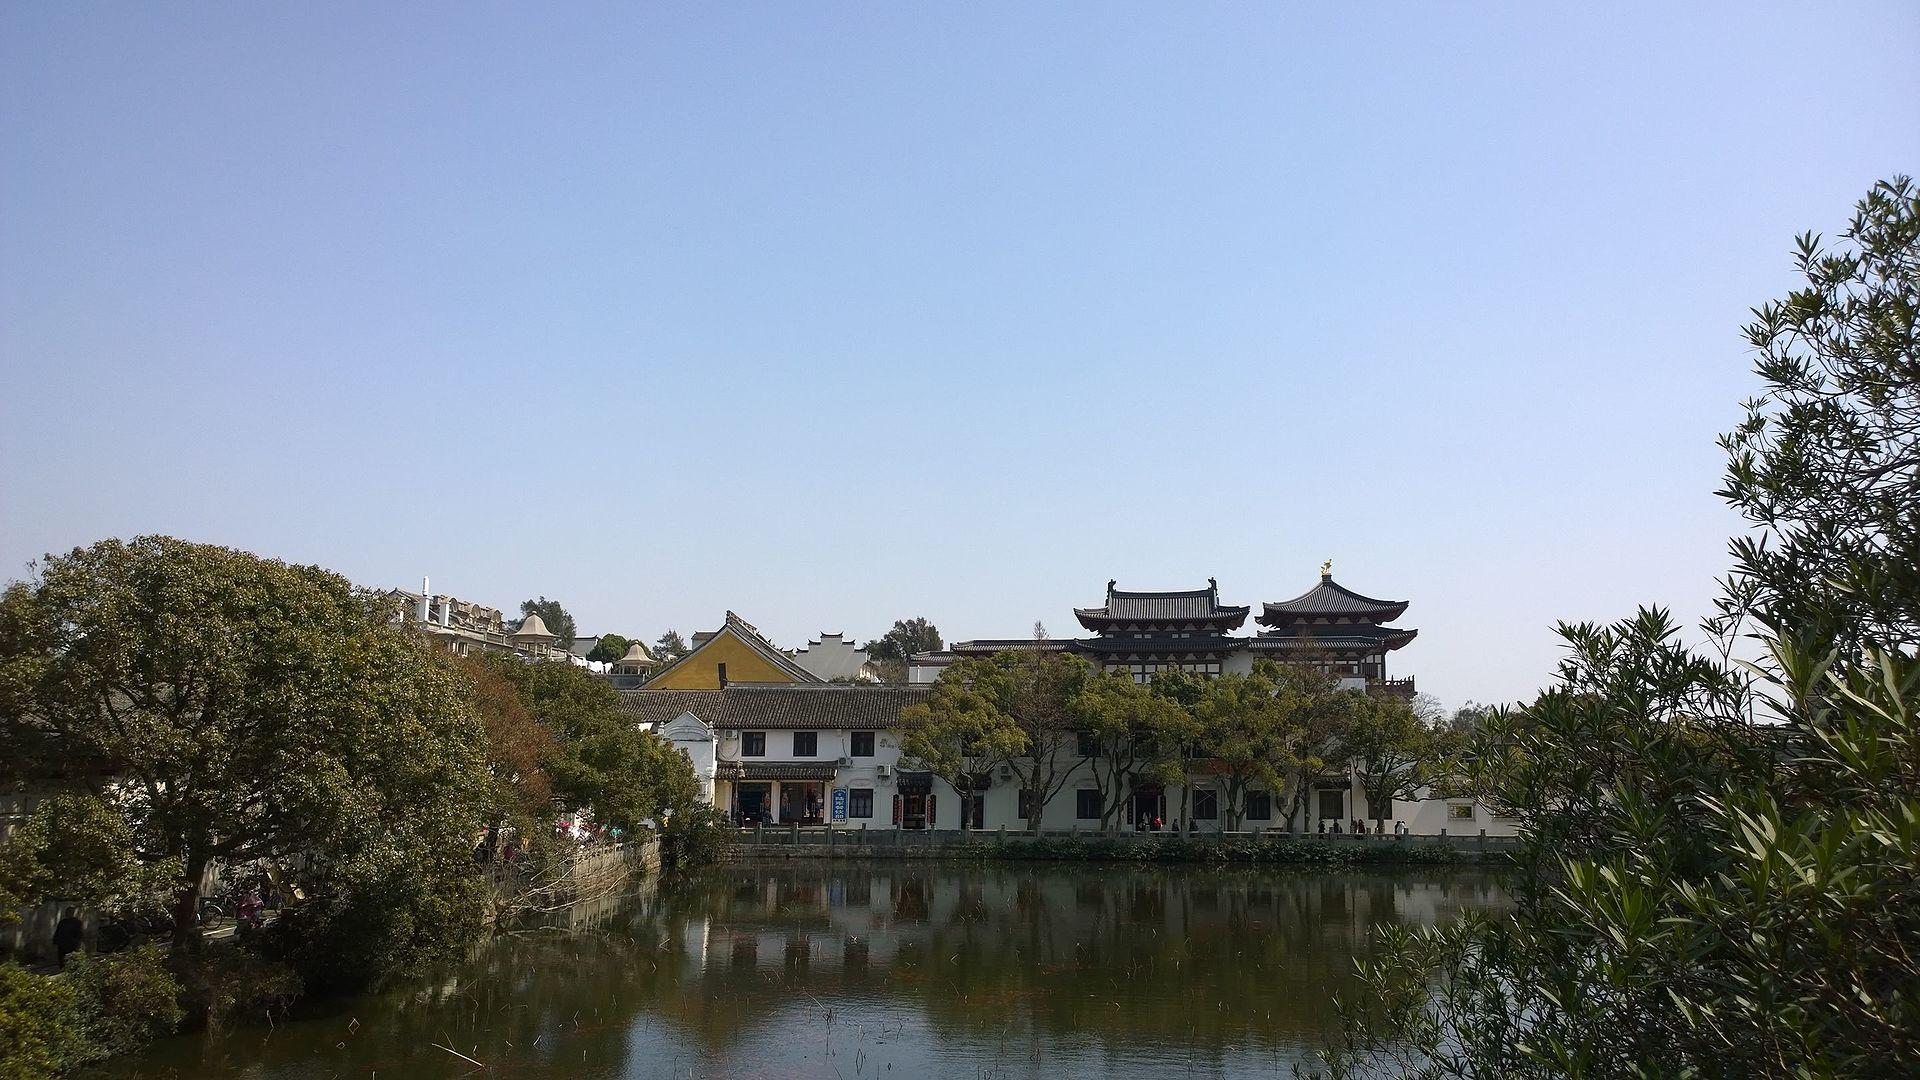 Lake_and_Building_at_the_Puji_Temple_in_Putuoshan_China.jpg